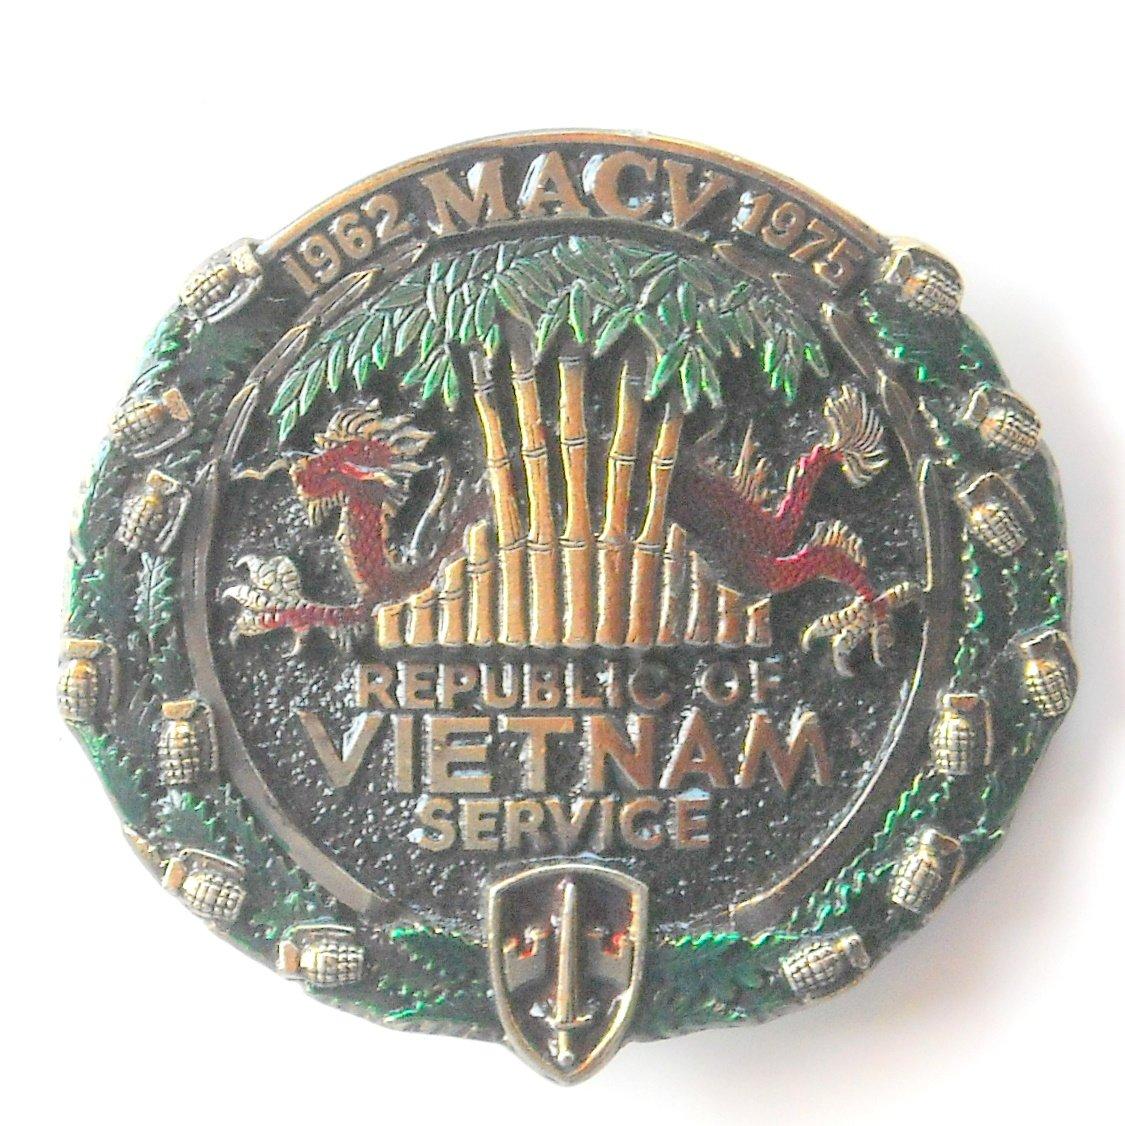 MACV Service Vintage Great American Buckle Co Republic Of Vietnam brass alloy belt buckle